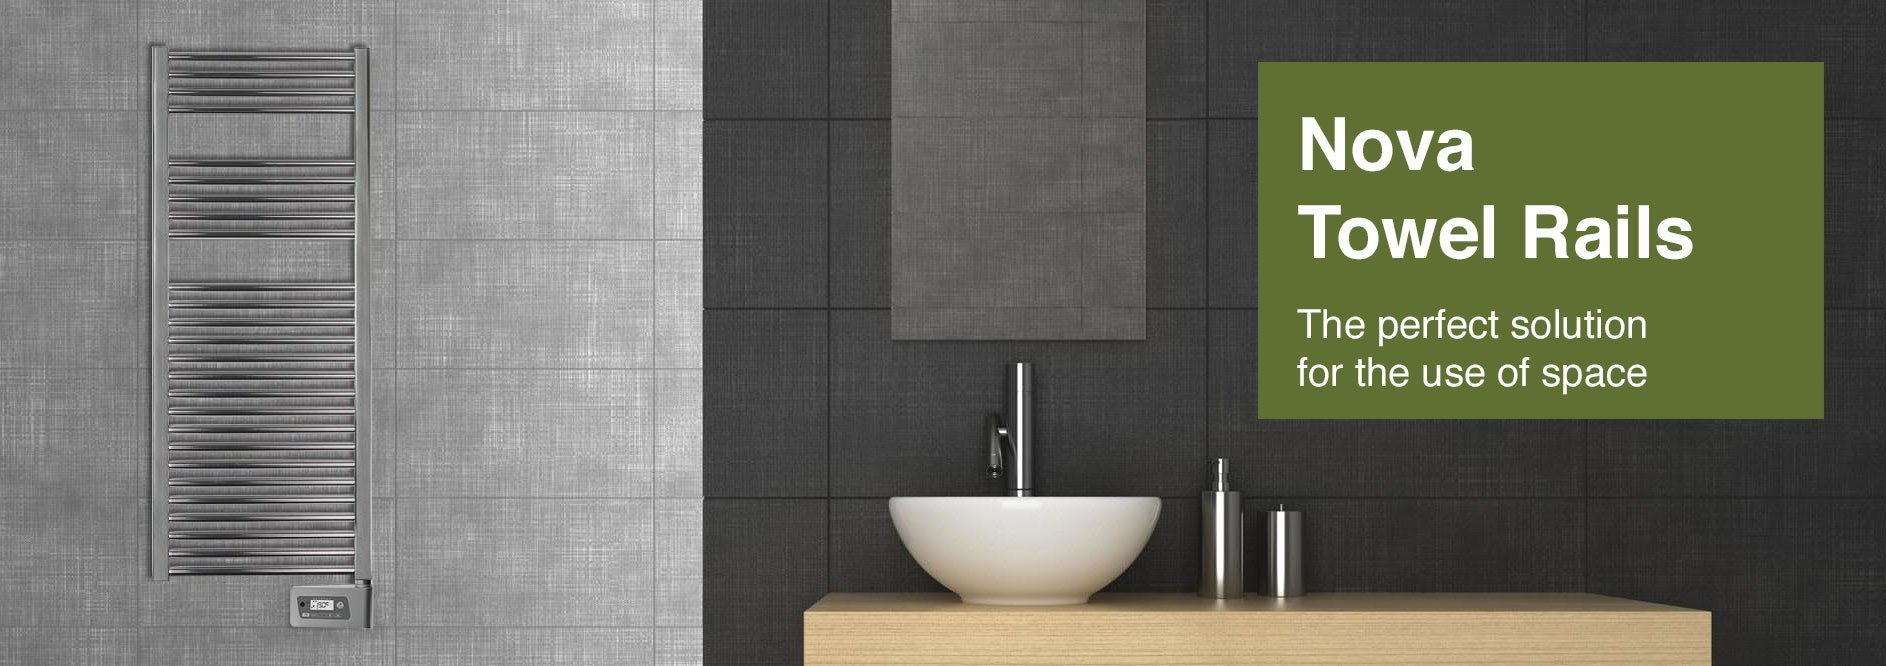 Nova Towel Rails electric heaters in modern bathroom